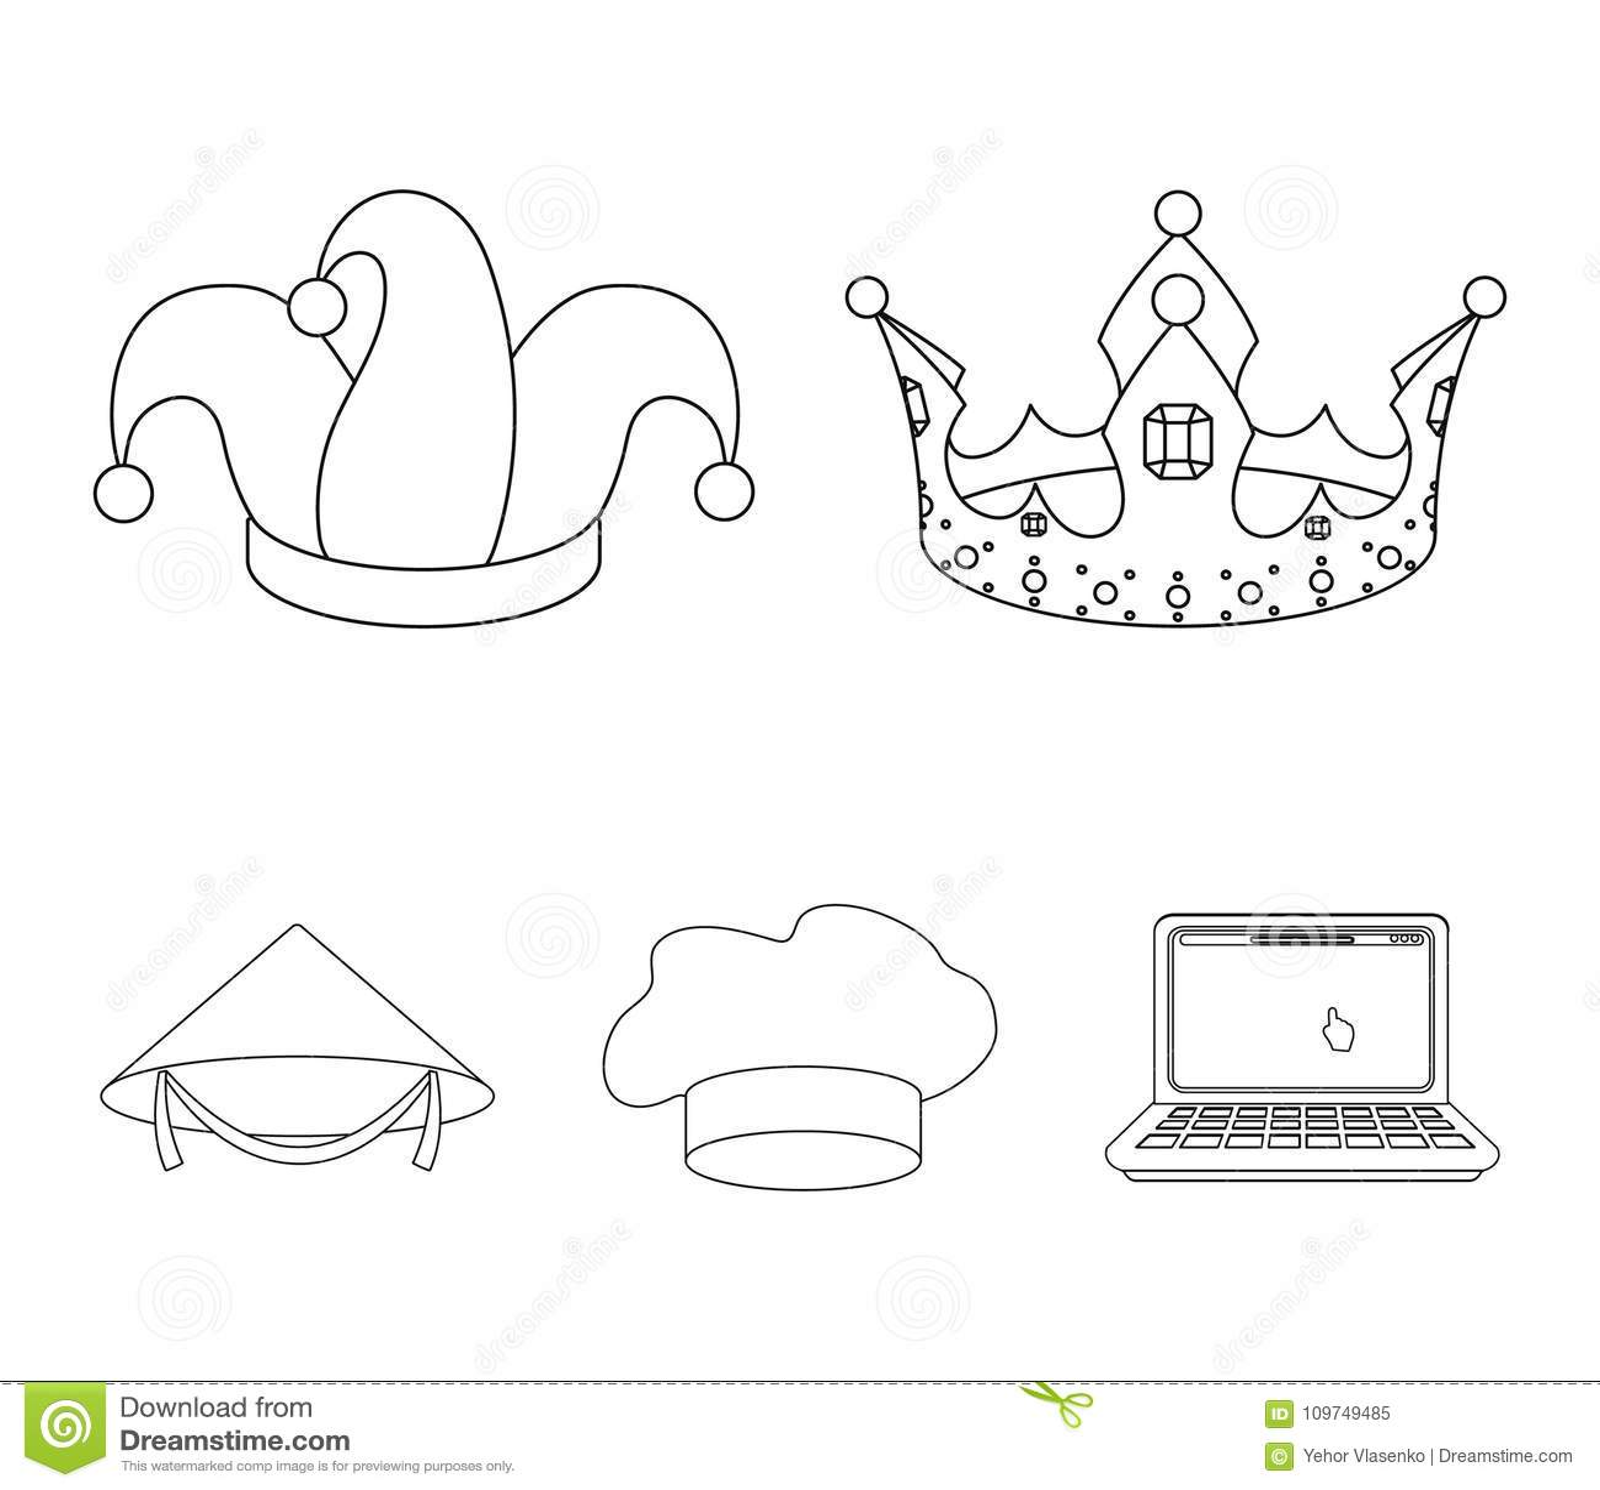 Krönen Sie, Spaßvogel ` s Kappe, Koch, Kegel Hüte stellten Sammlungsikonen im Entwurfsartvektorsymbolvorrat-Illustrationsnetz ein